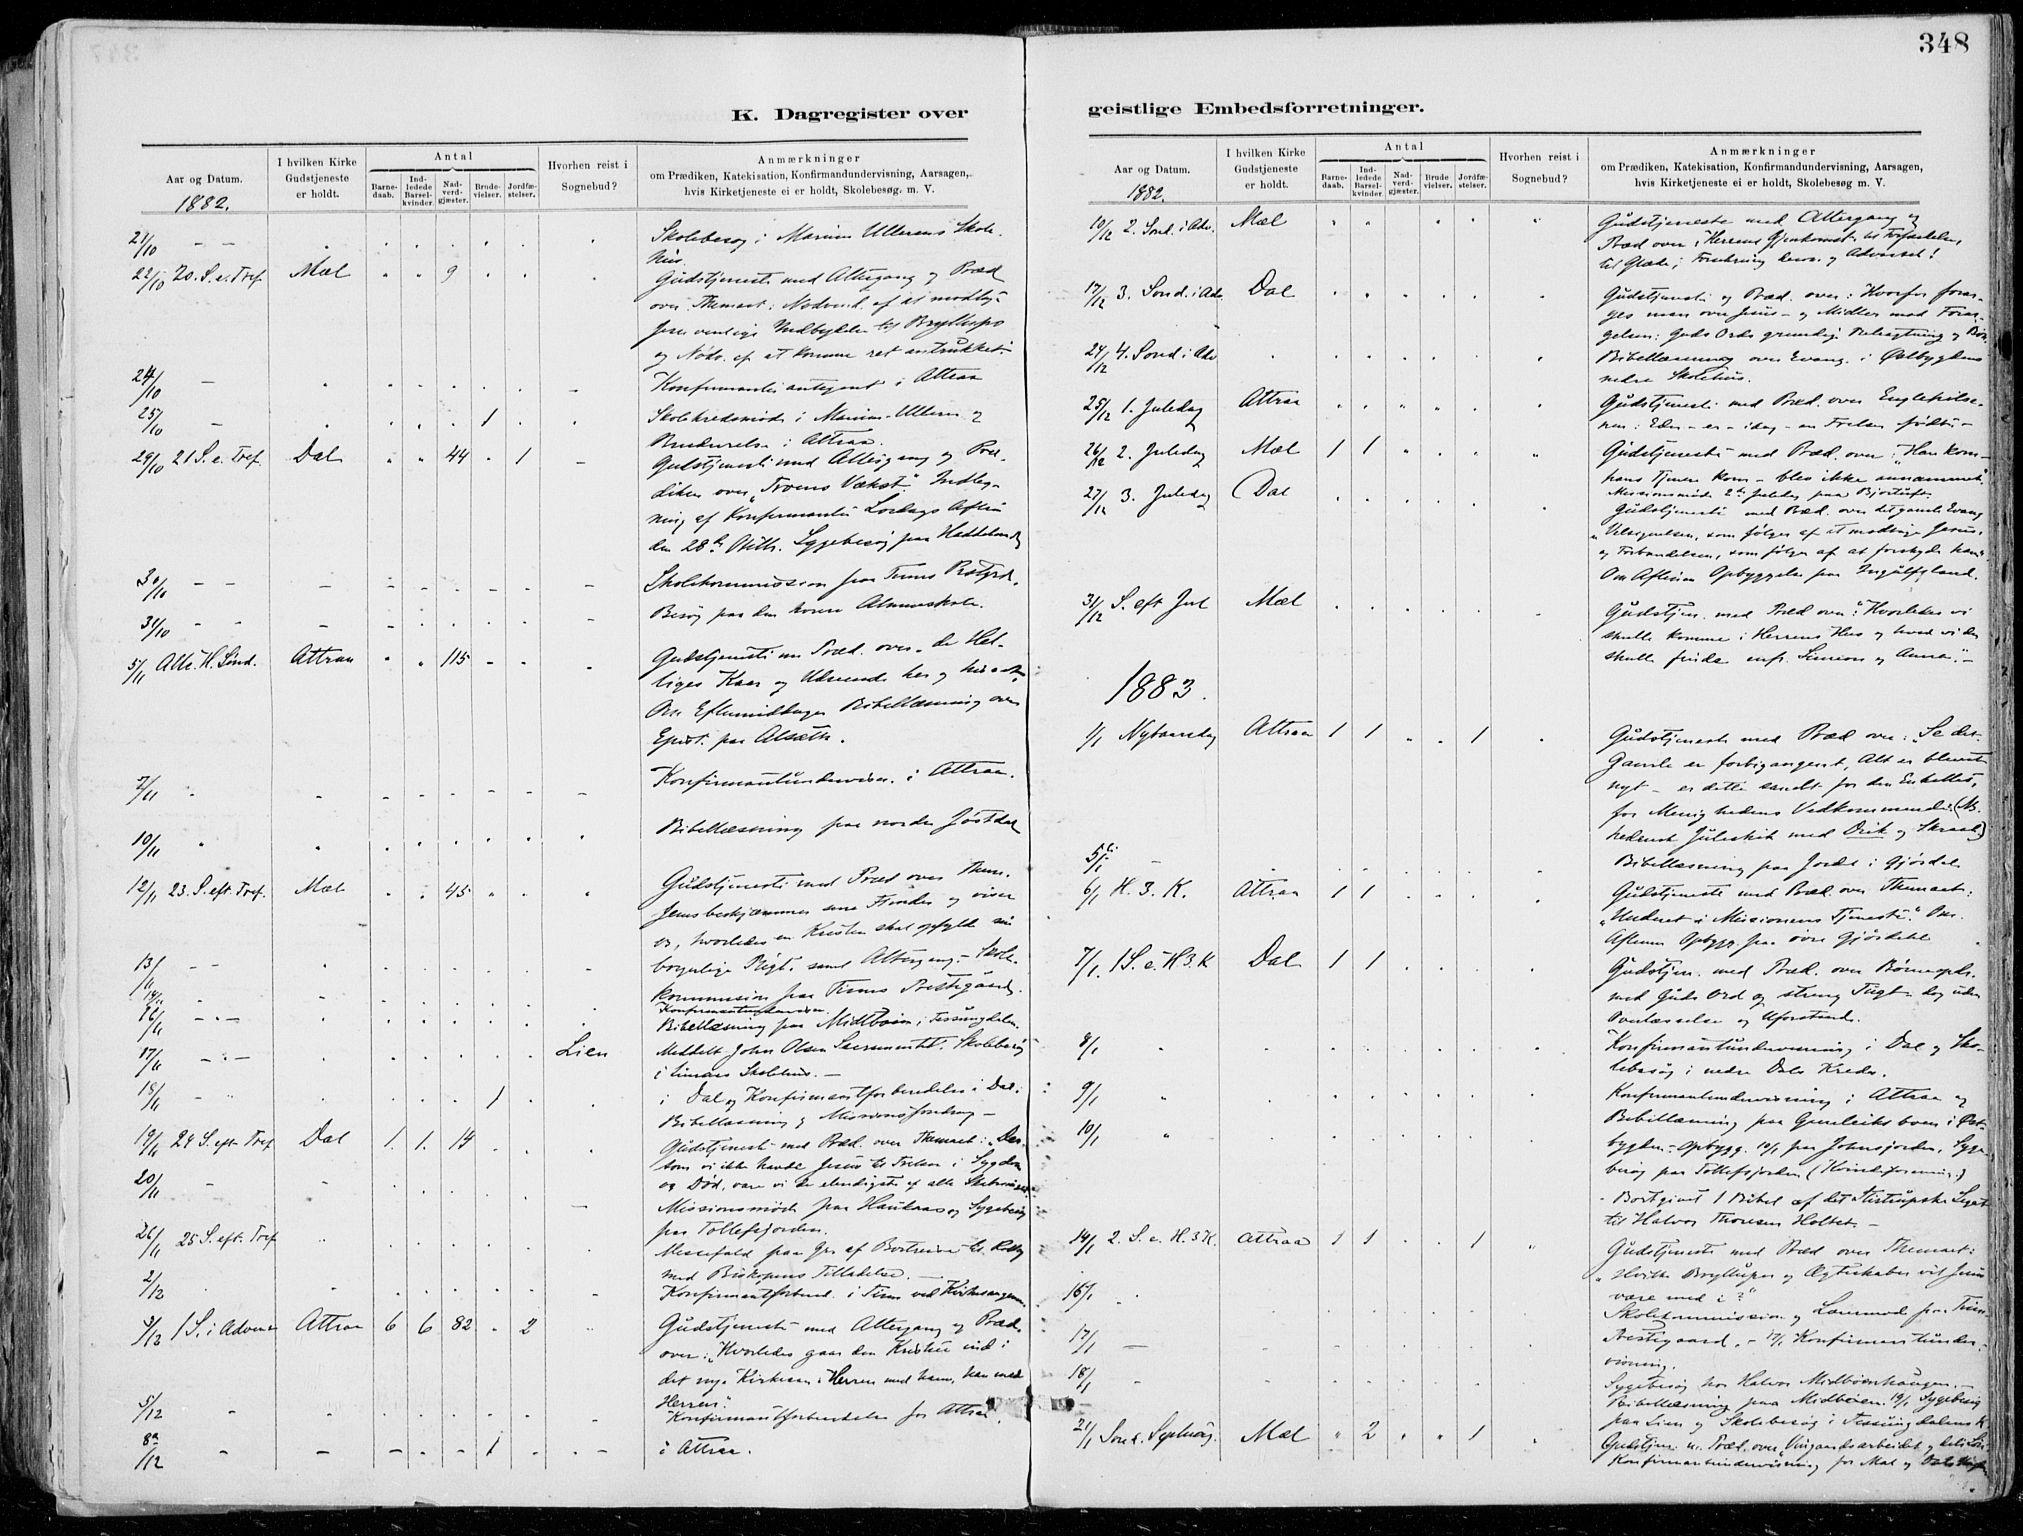 SAKO, Tinn kirkebøker, F/Fa/L0007: Ministerialbok nr. I 7, 1878-1922, s. 348